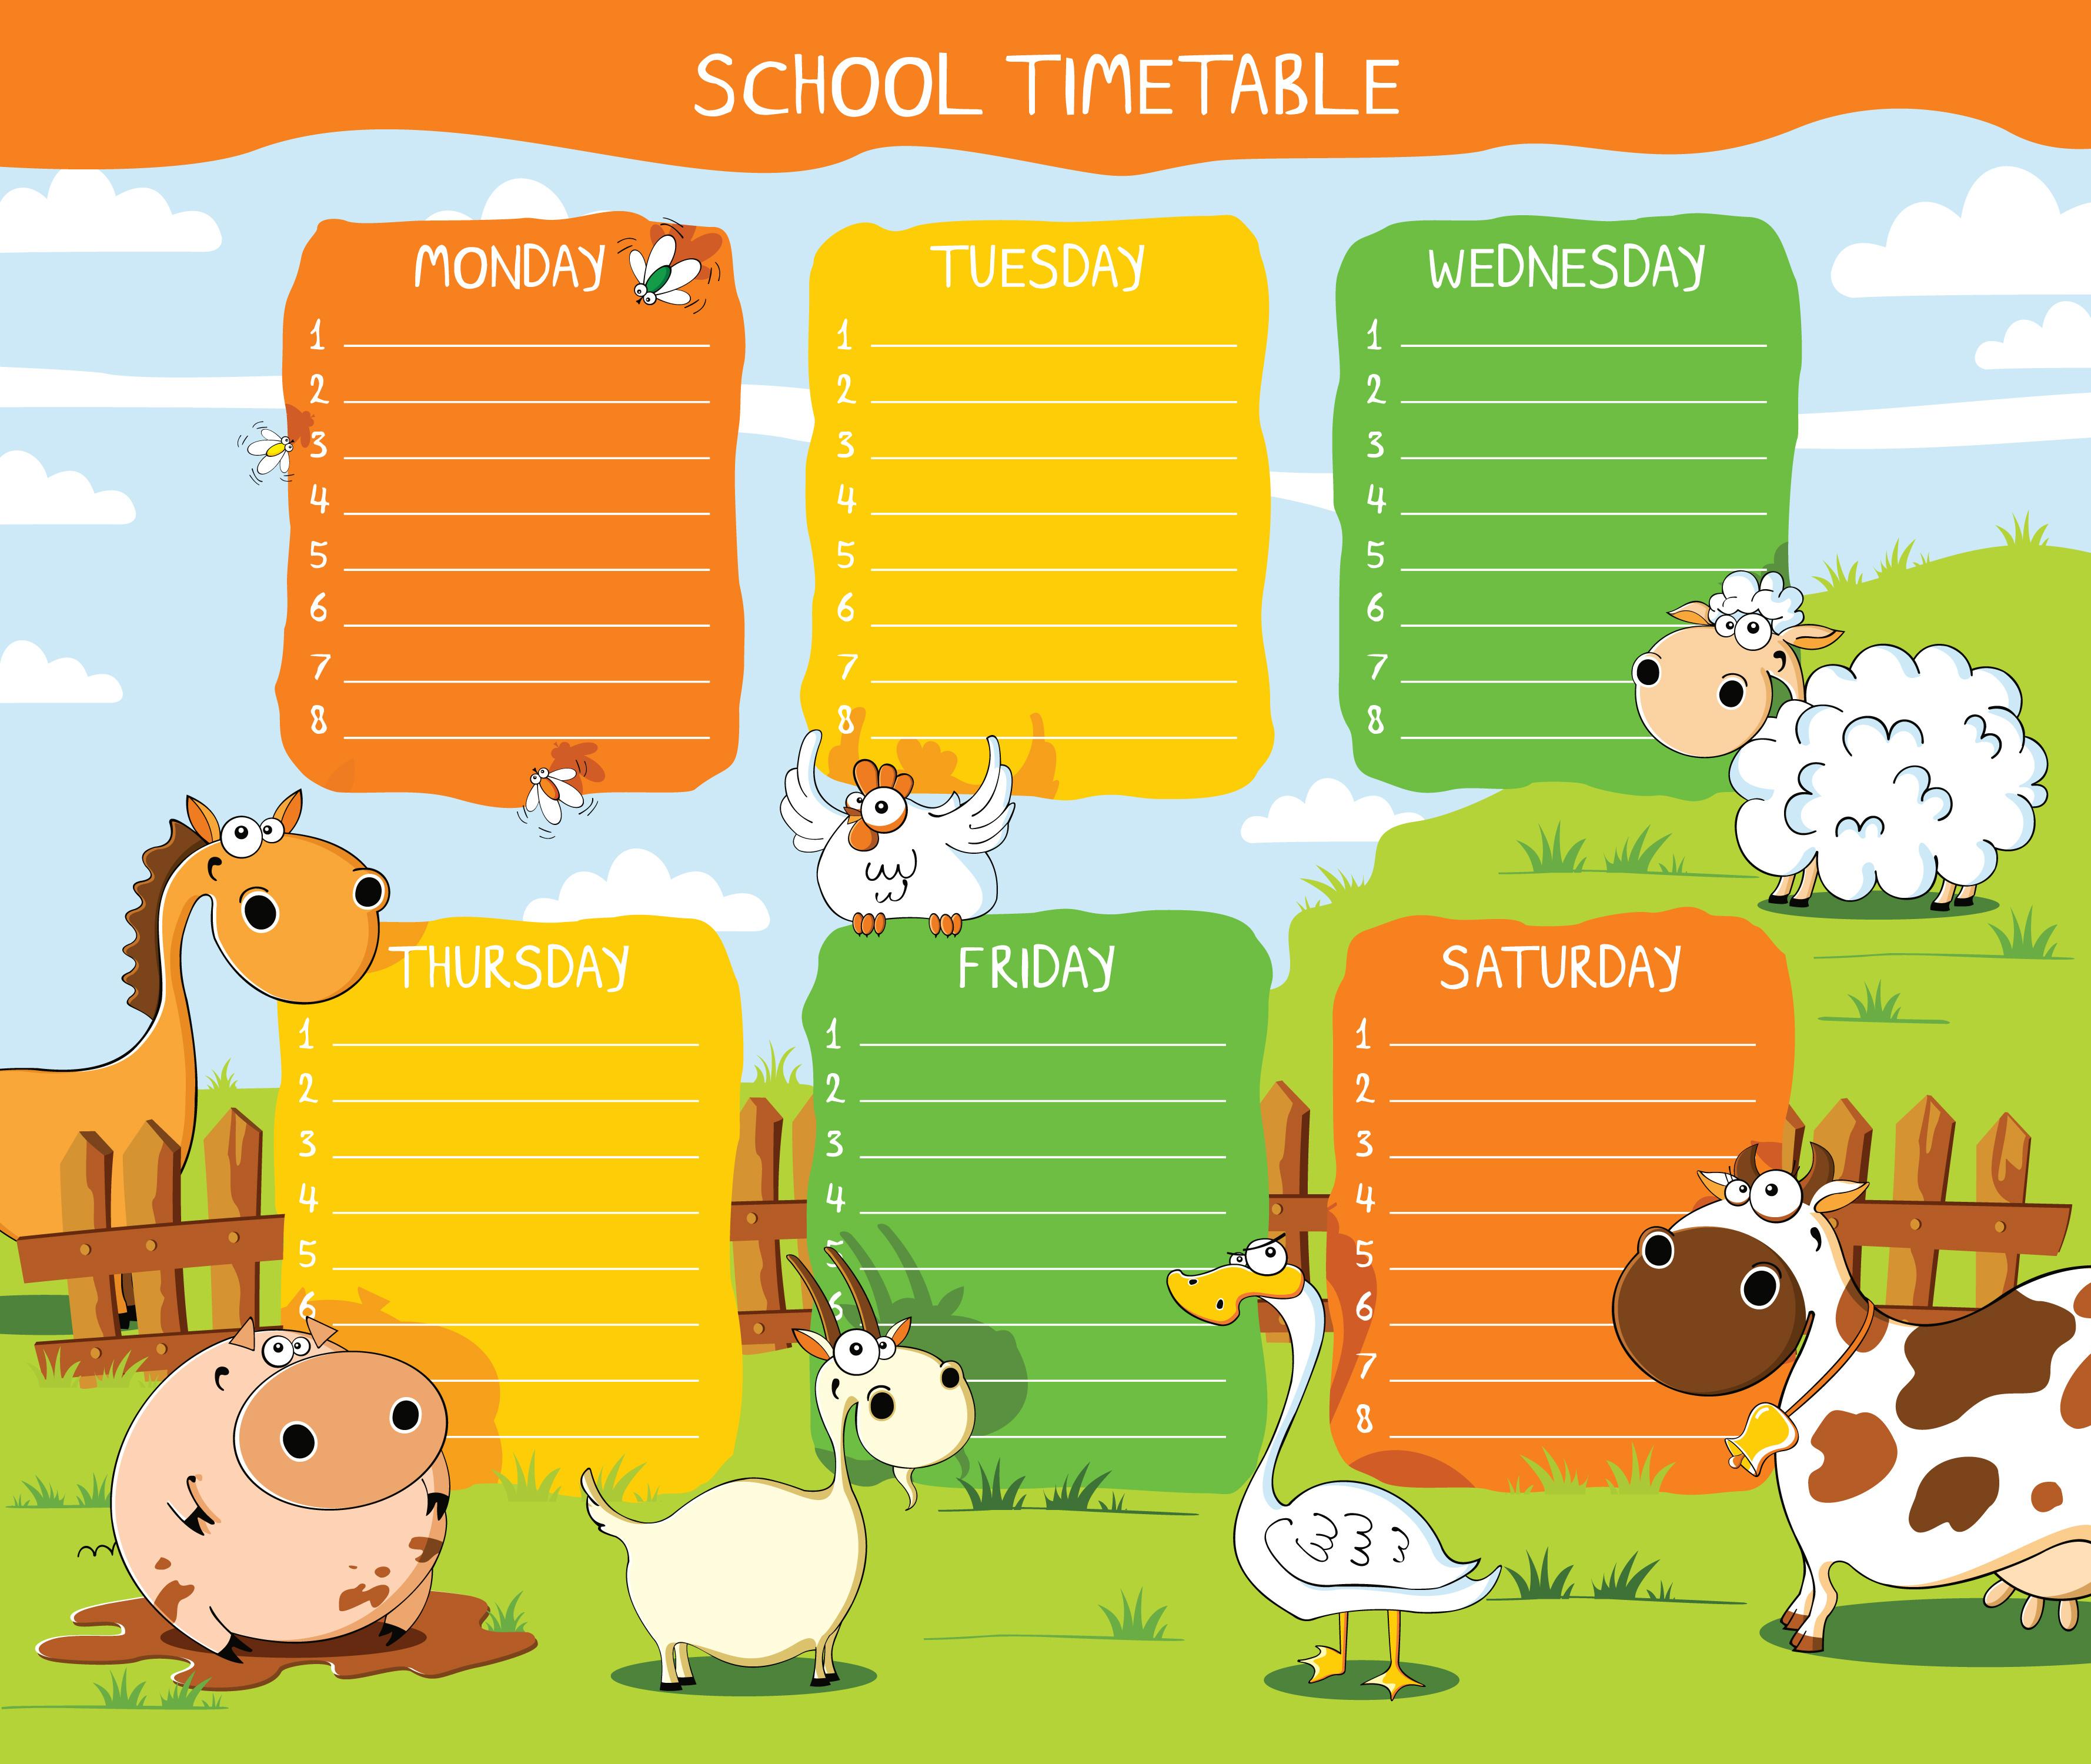 school-timetable-horarios-en-ingles6